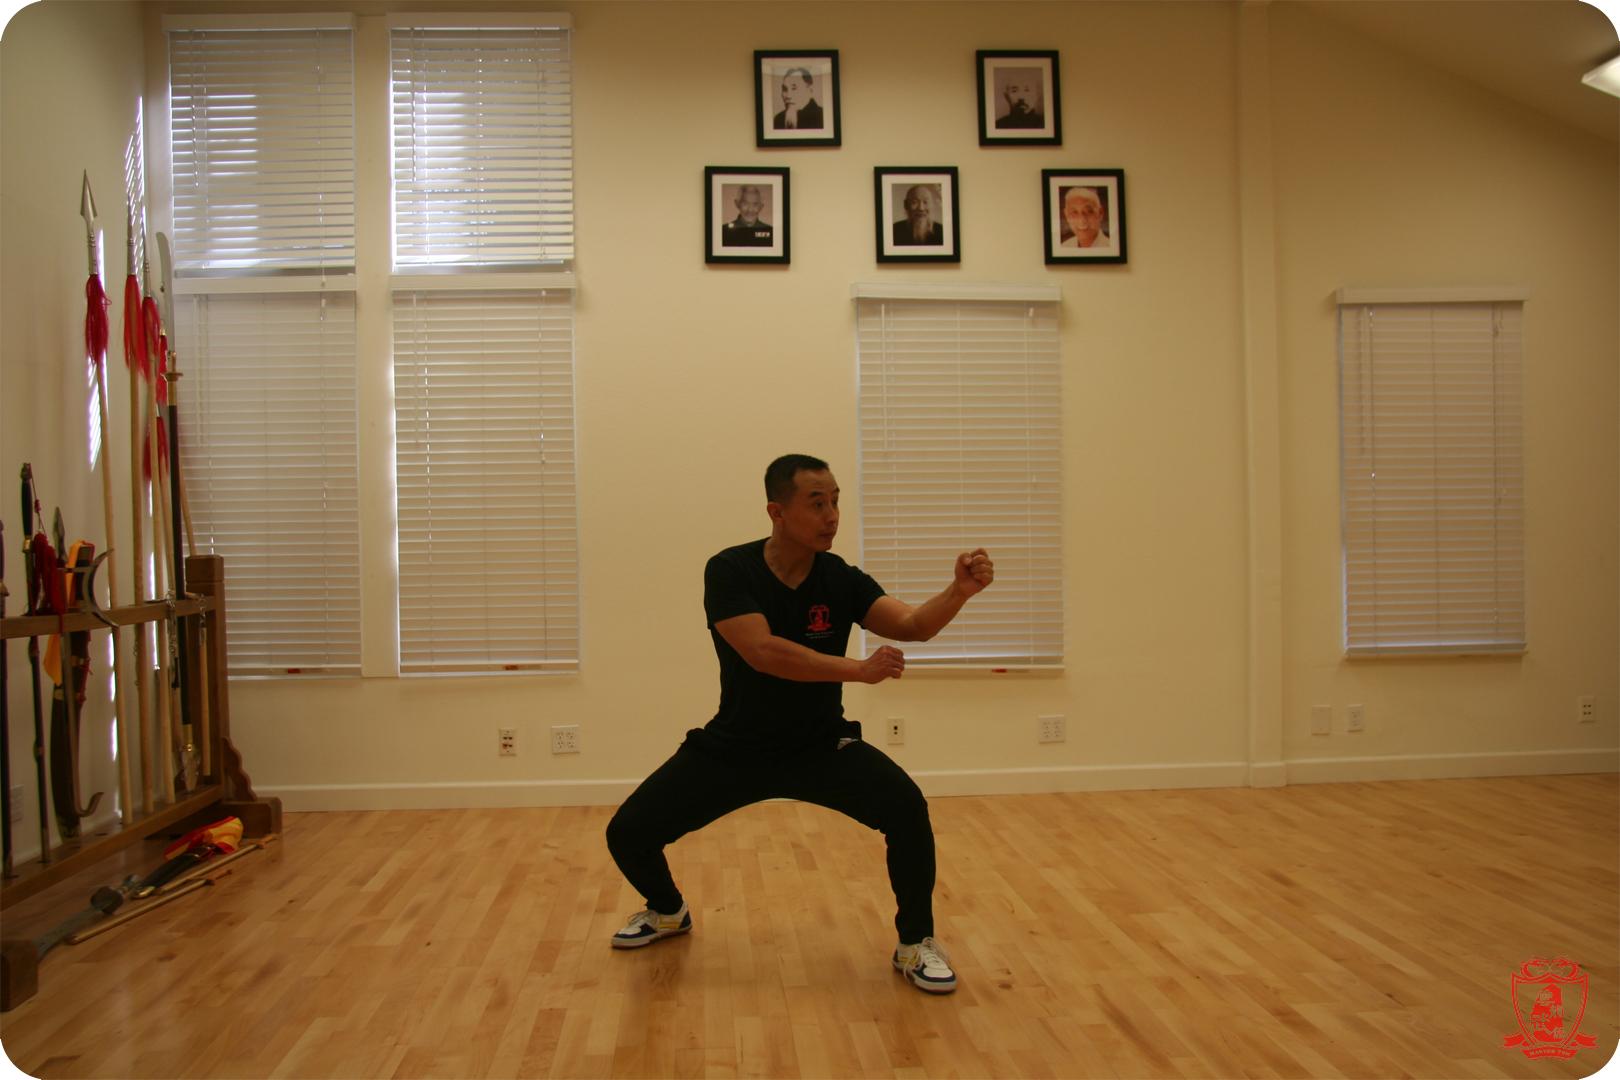 Master Yun Fanzi Quan Pose_Rounded Corners.jpg